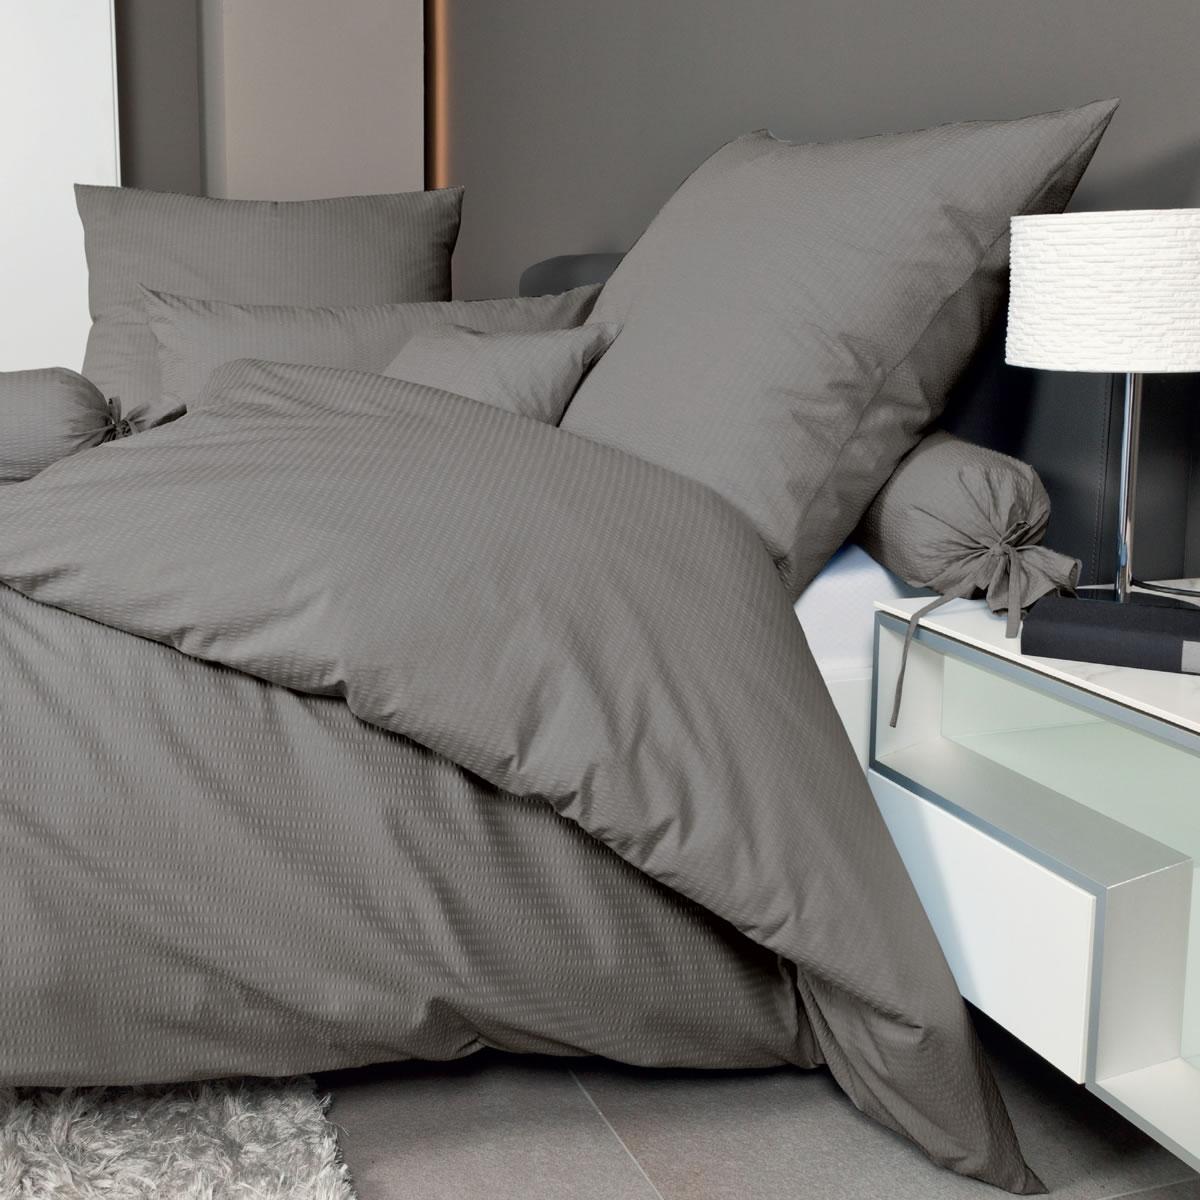 janine uni mako soft seersucker bettw sche 0125 piano 135x200 155x200 155x220 ebay. Black Bedroom Furniture Sets. Home Design Ideas